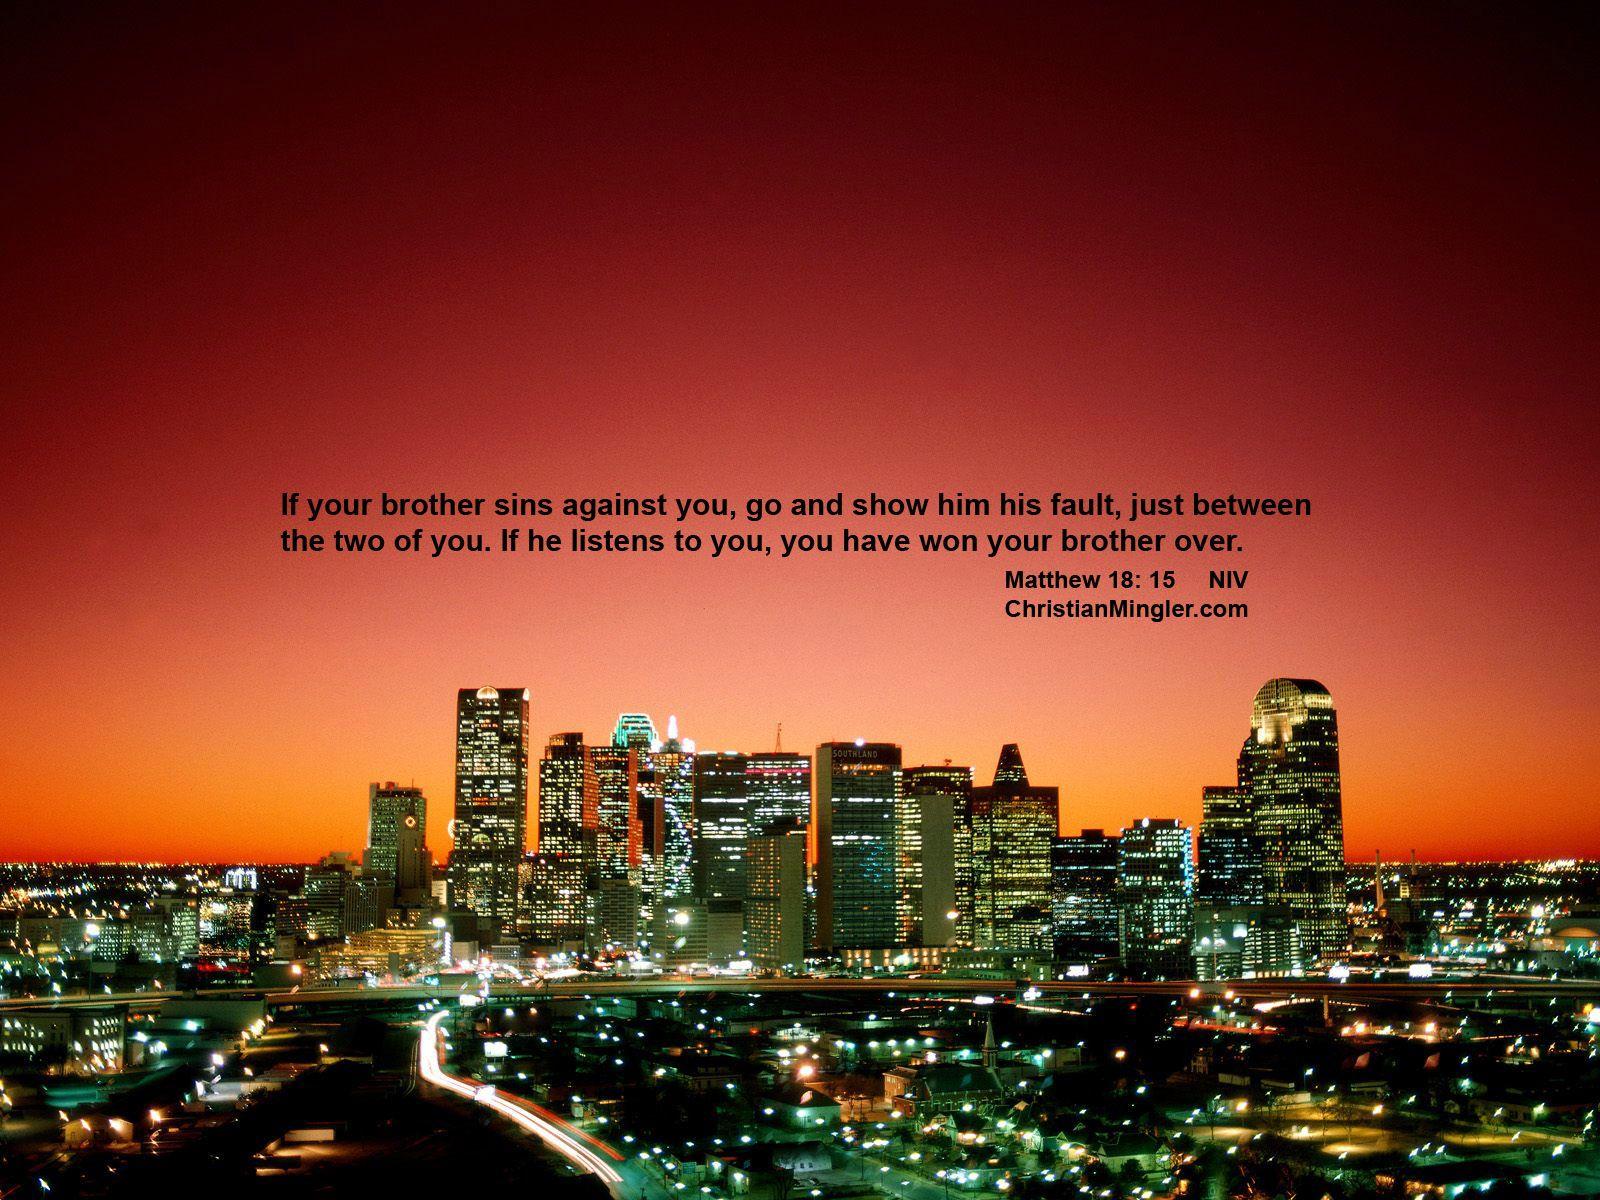 Matthew-18 15